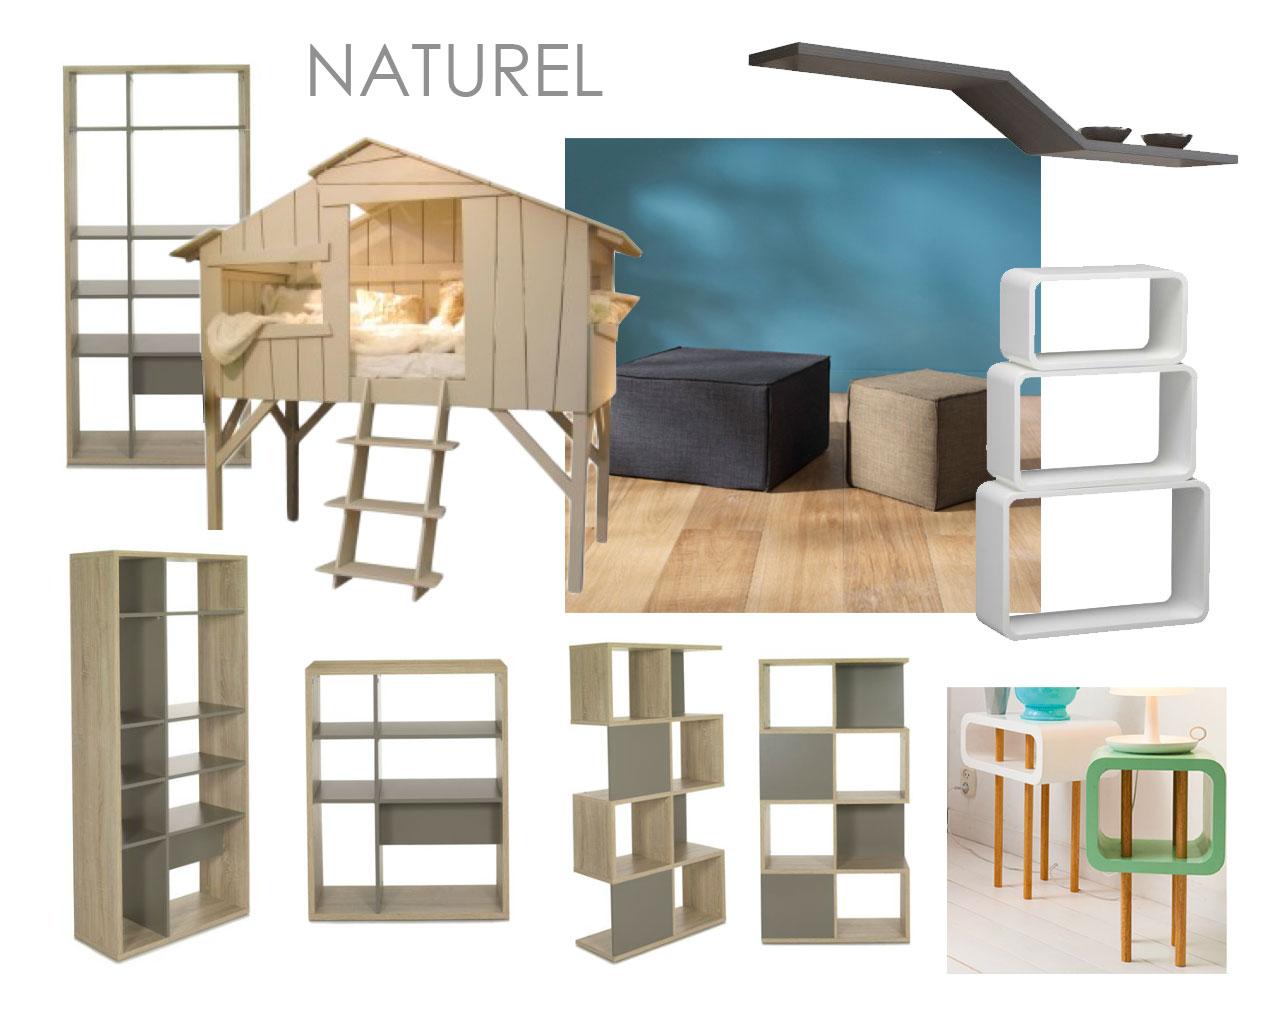 Mobilier-Milan-Nature